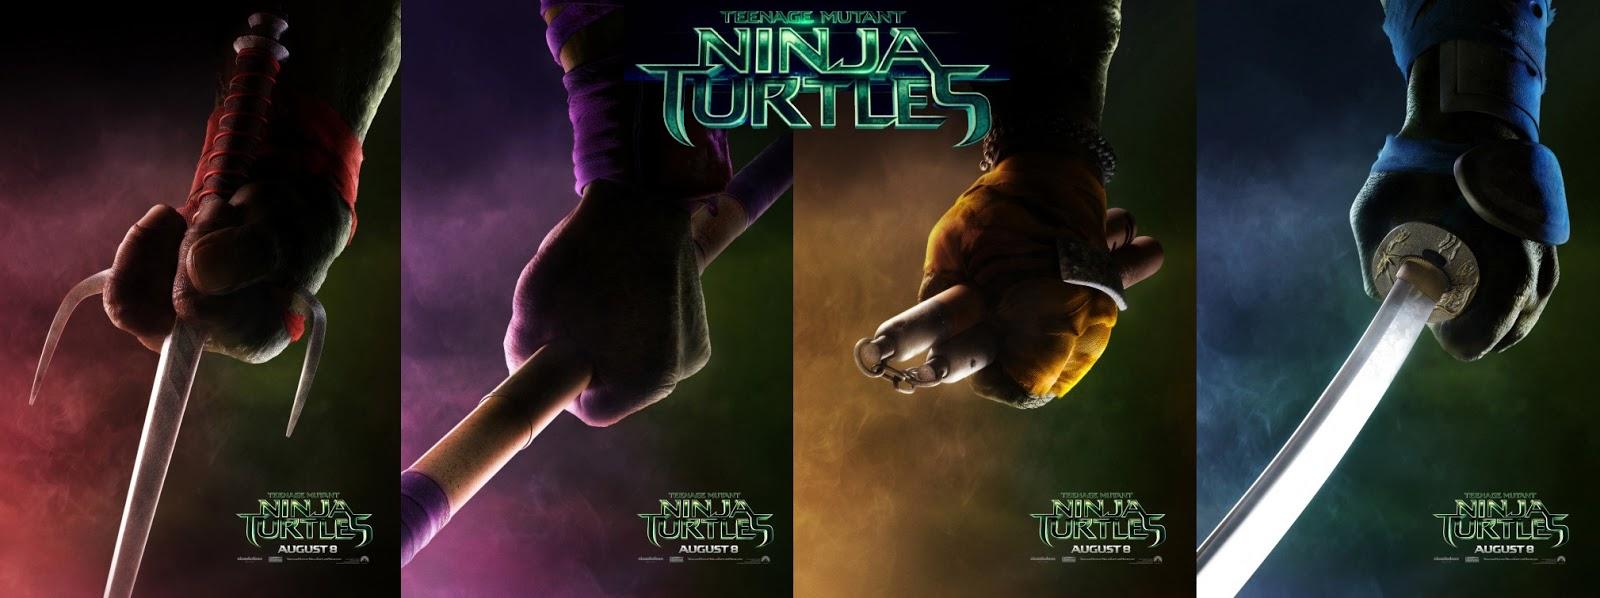 Dcf Blog Teenage Mutant Ninja Turtles 2014 Splinter Shredder And Ninja Blings